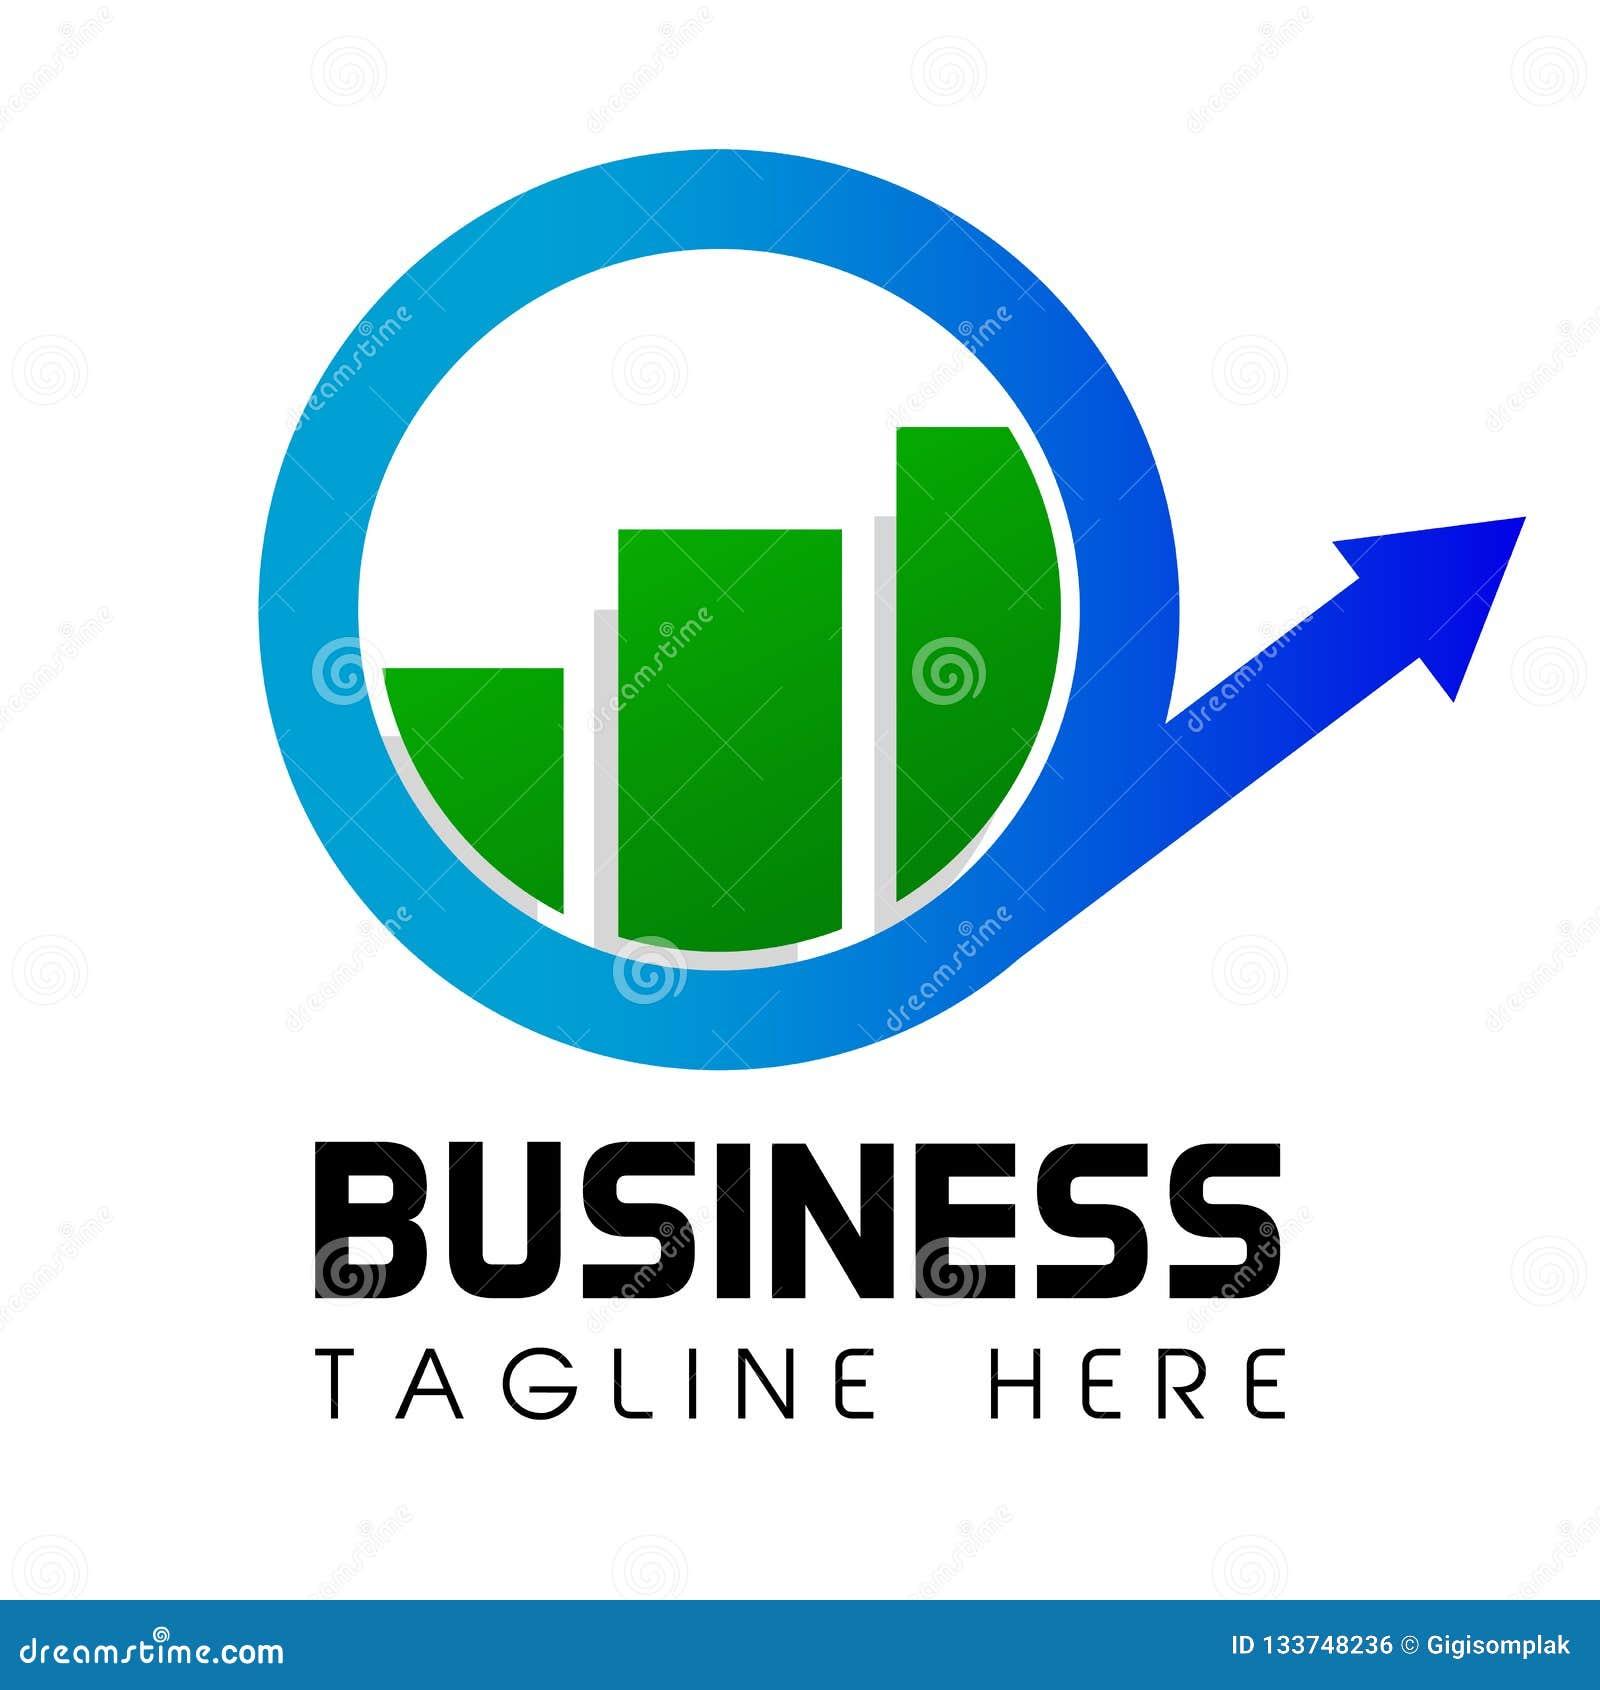 Простое Shinning дело или вклад логотипа стрелки и бара Cirle ориентировали корпоративное